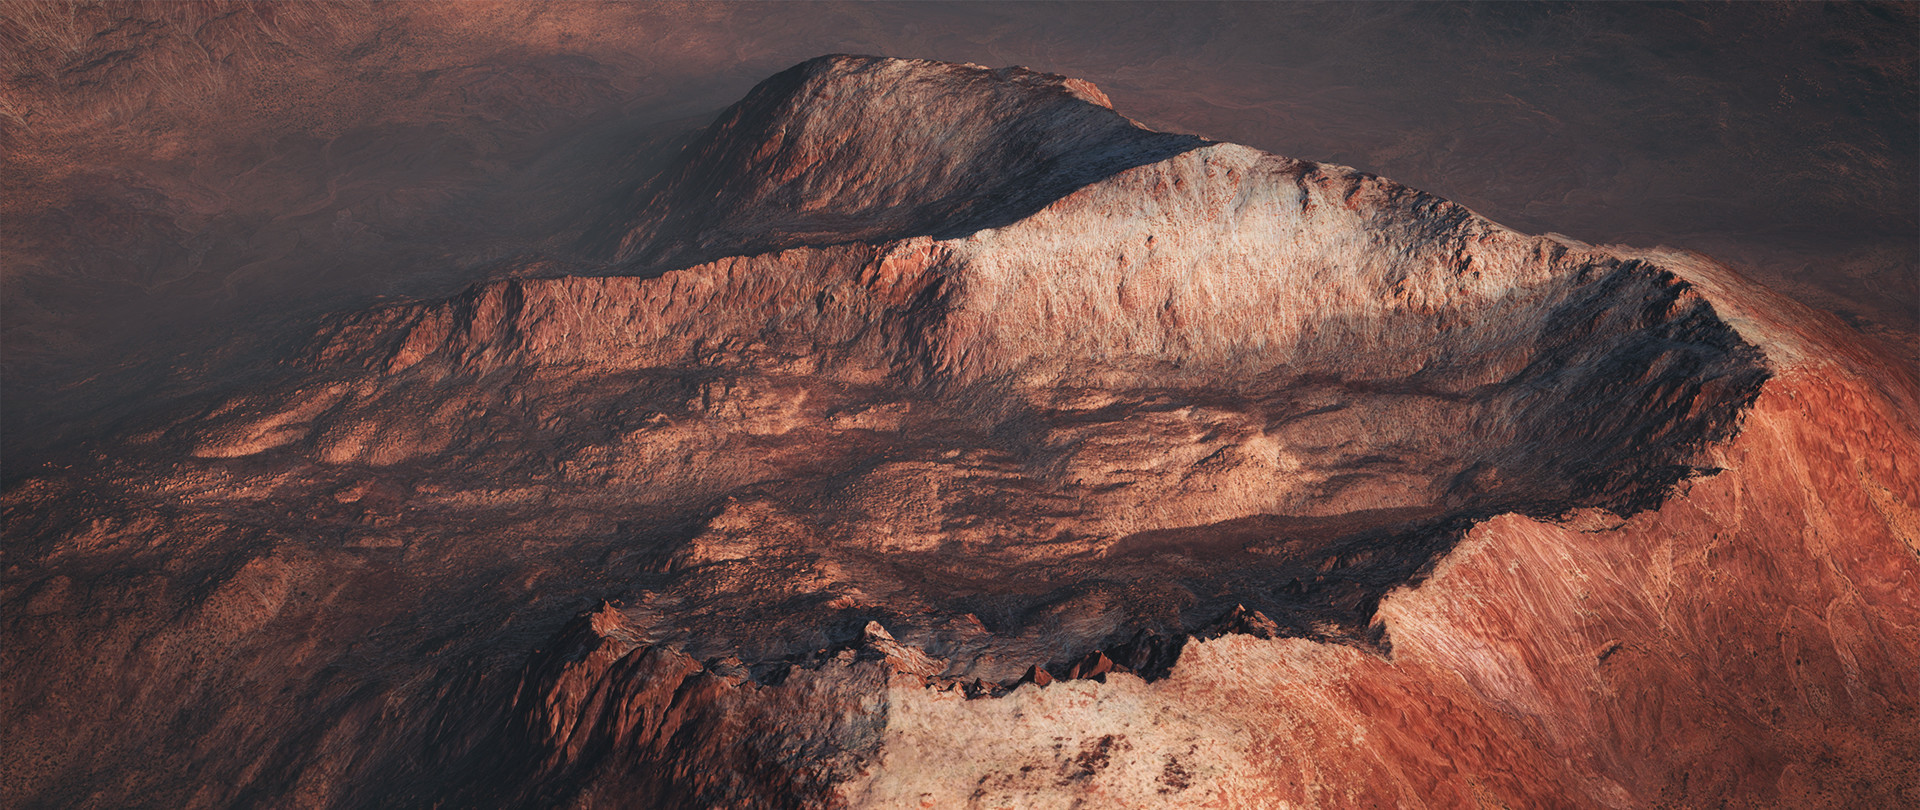 Joe garth joe garth skybrush desertmountains 02 1920x810